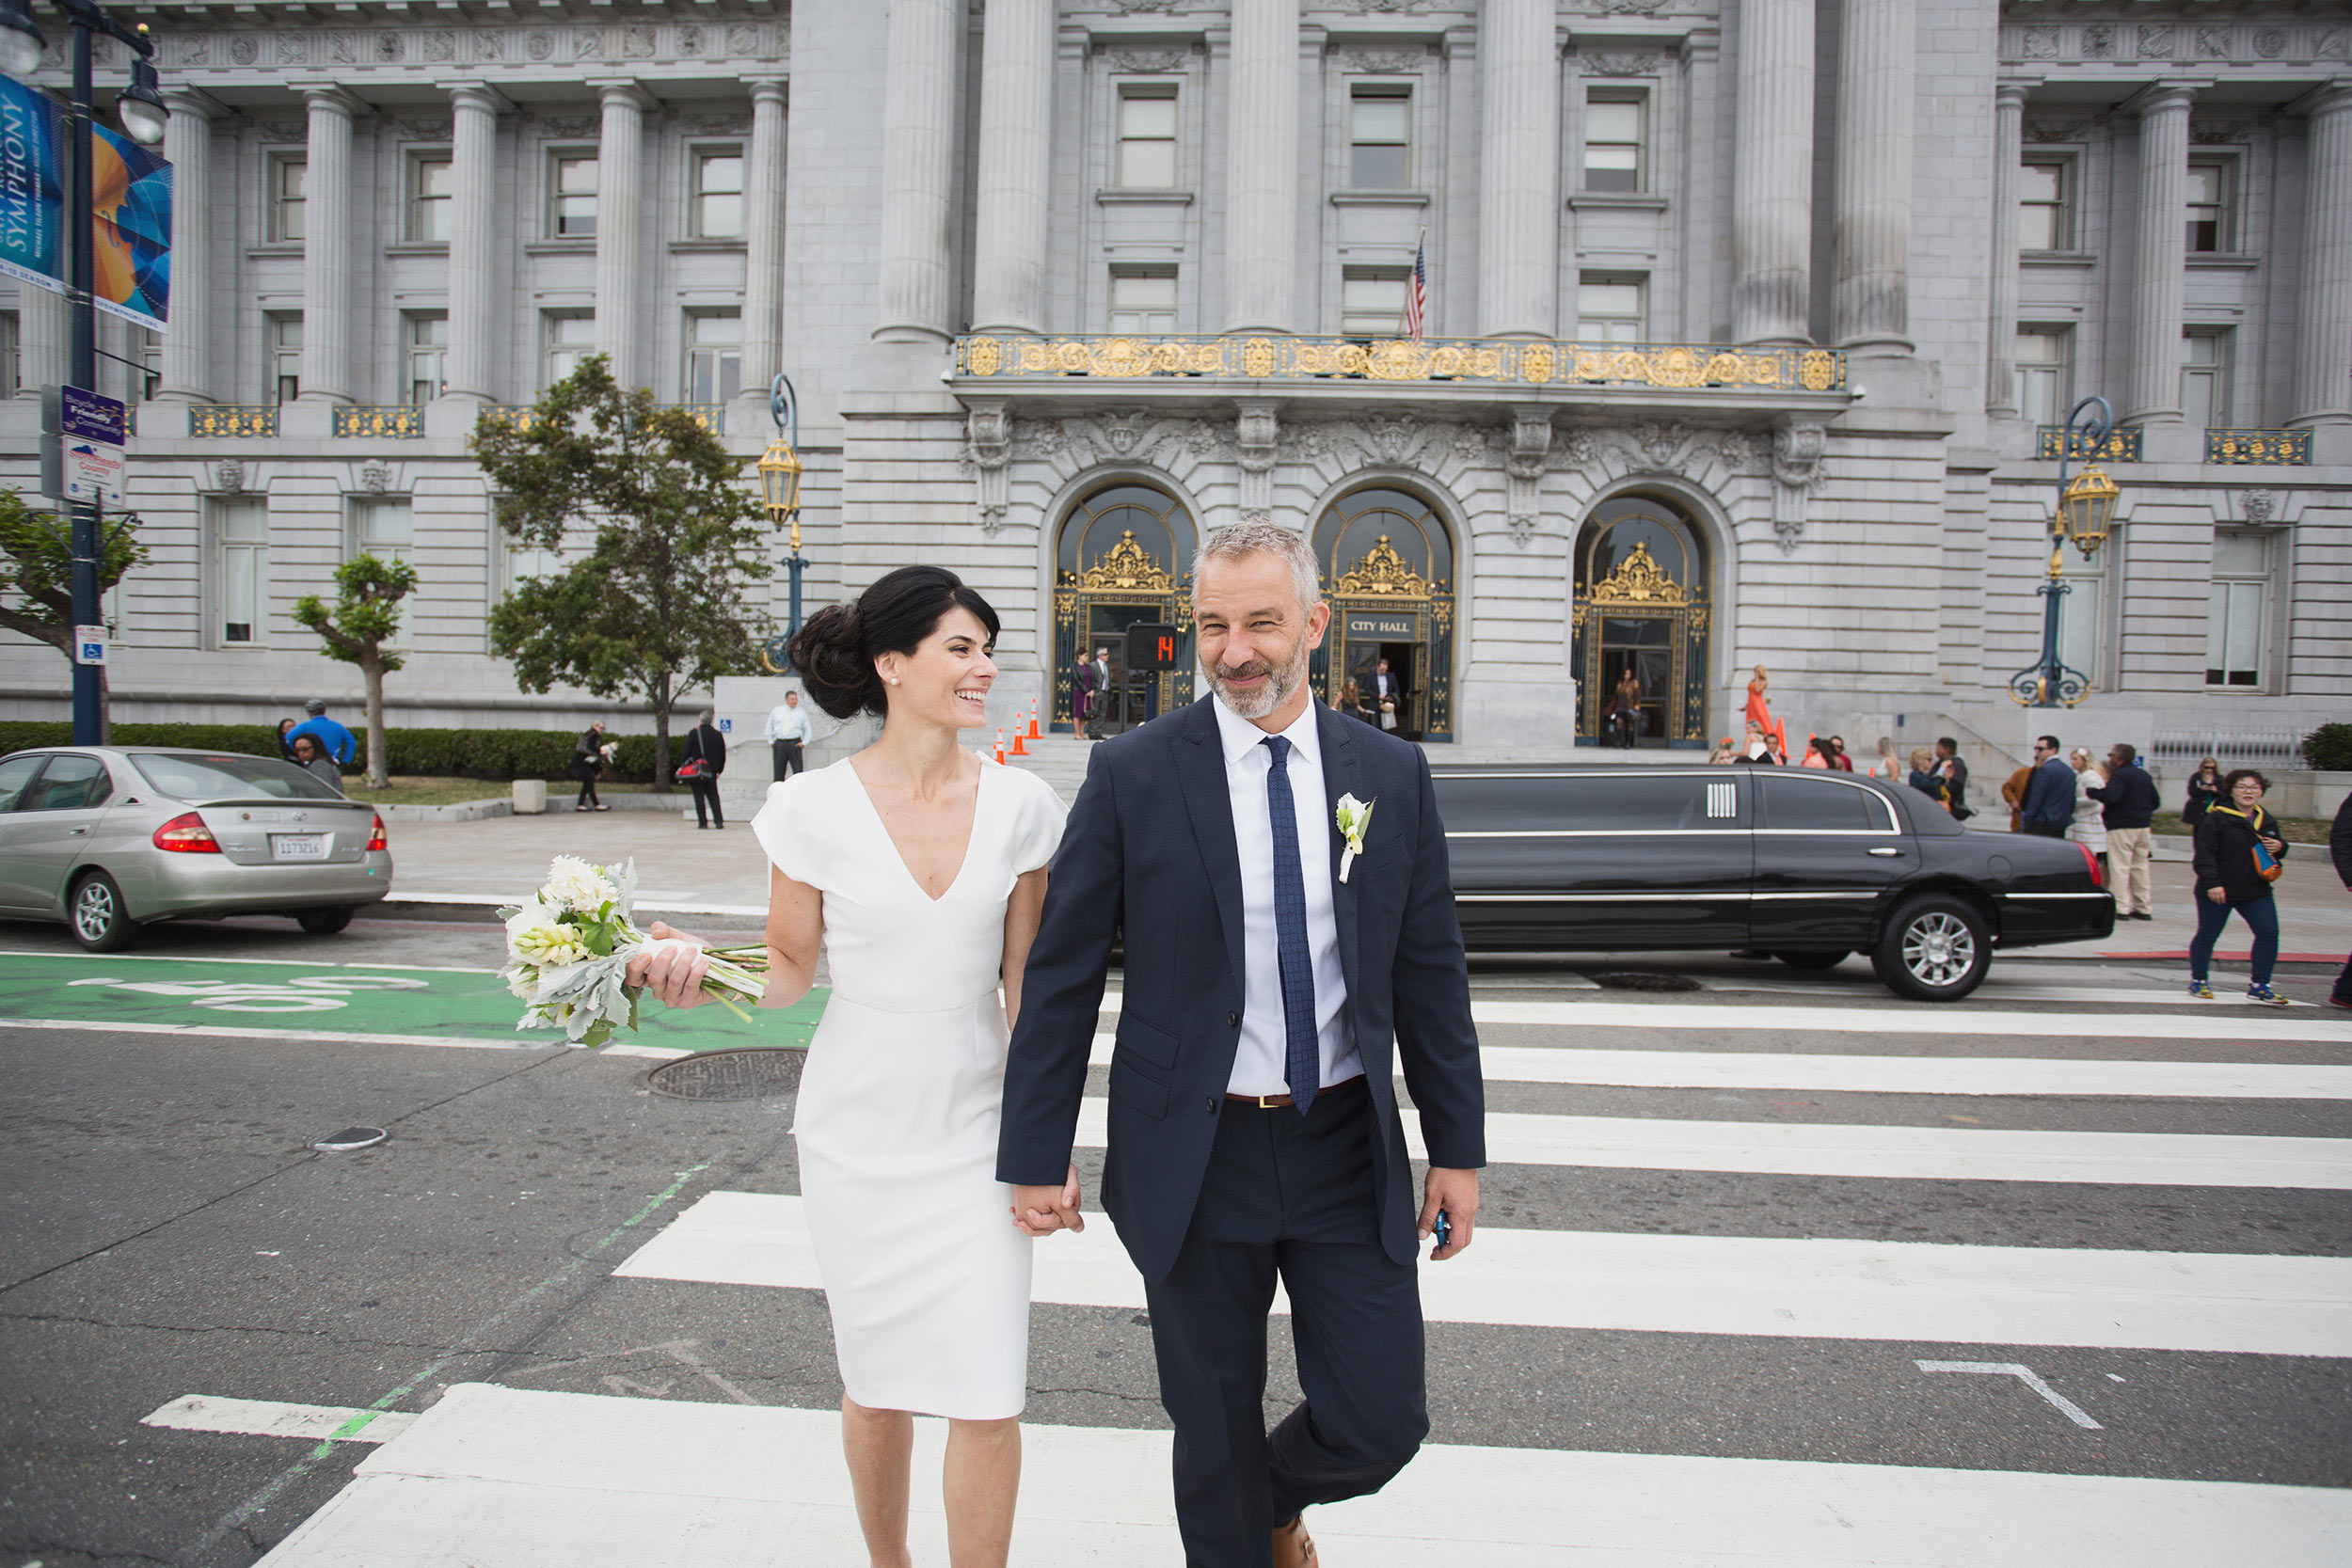 Crossing the street at San Francisco City Hall